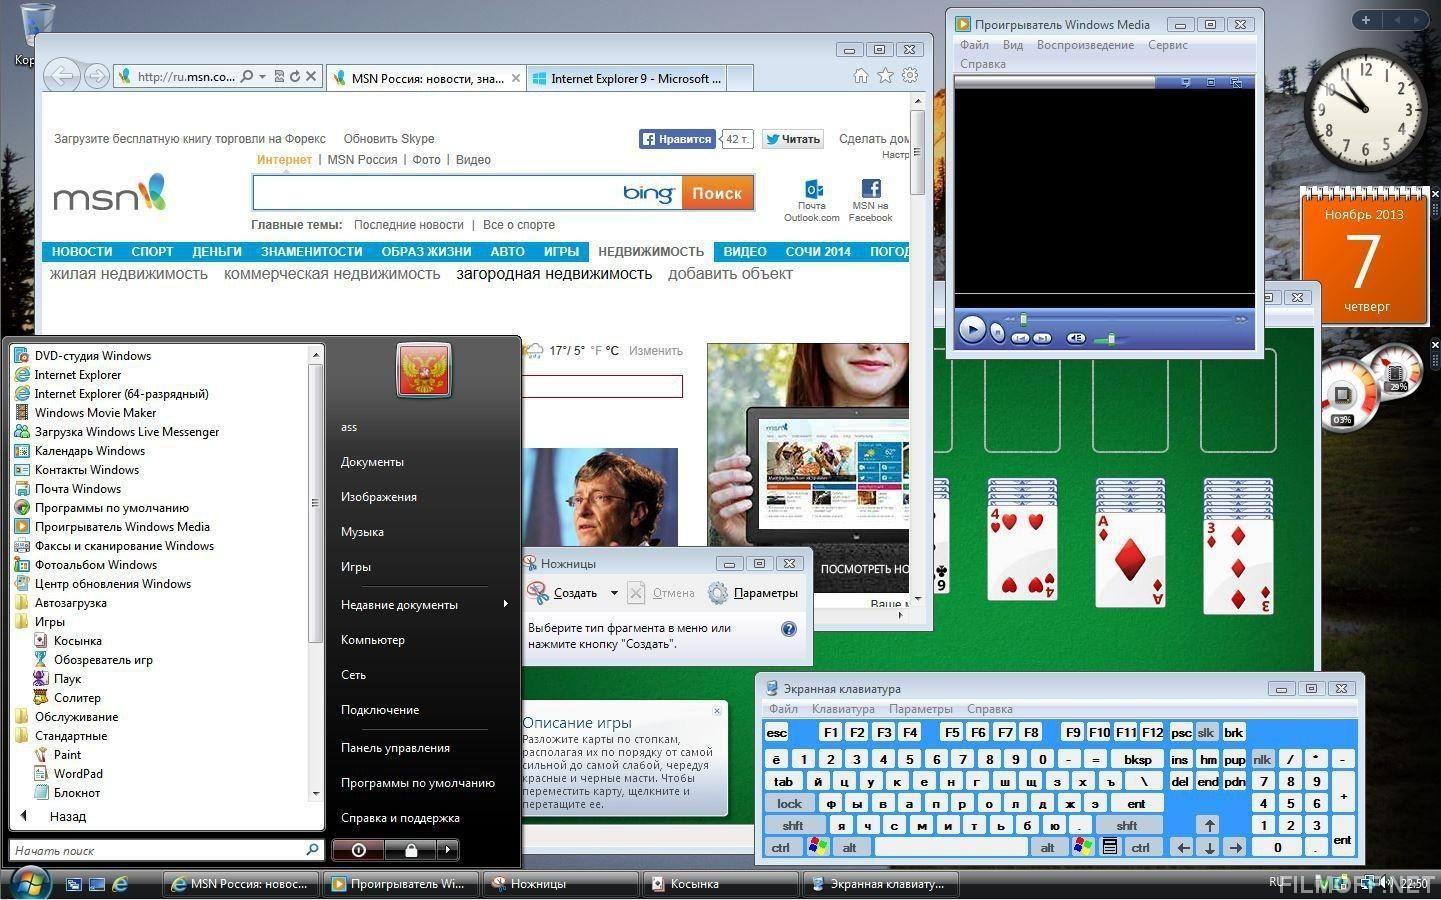 Windows Vista Ultimate Edition x86 Oem - Permanently Actived Edi crack